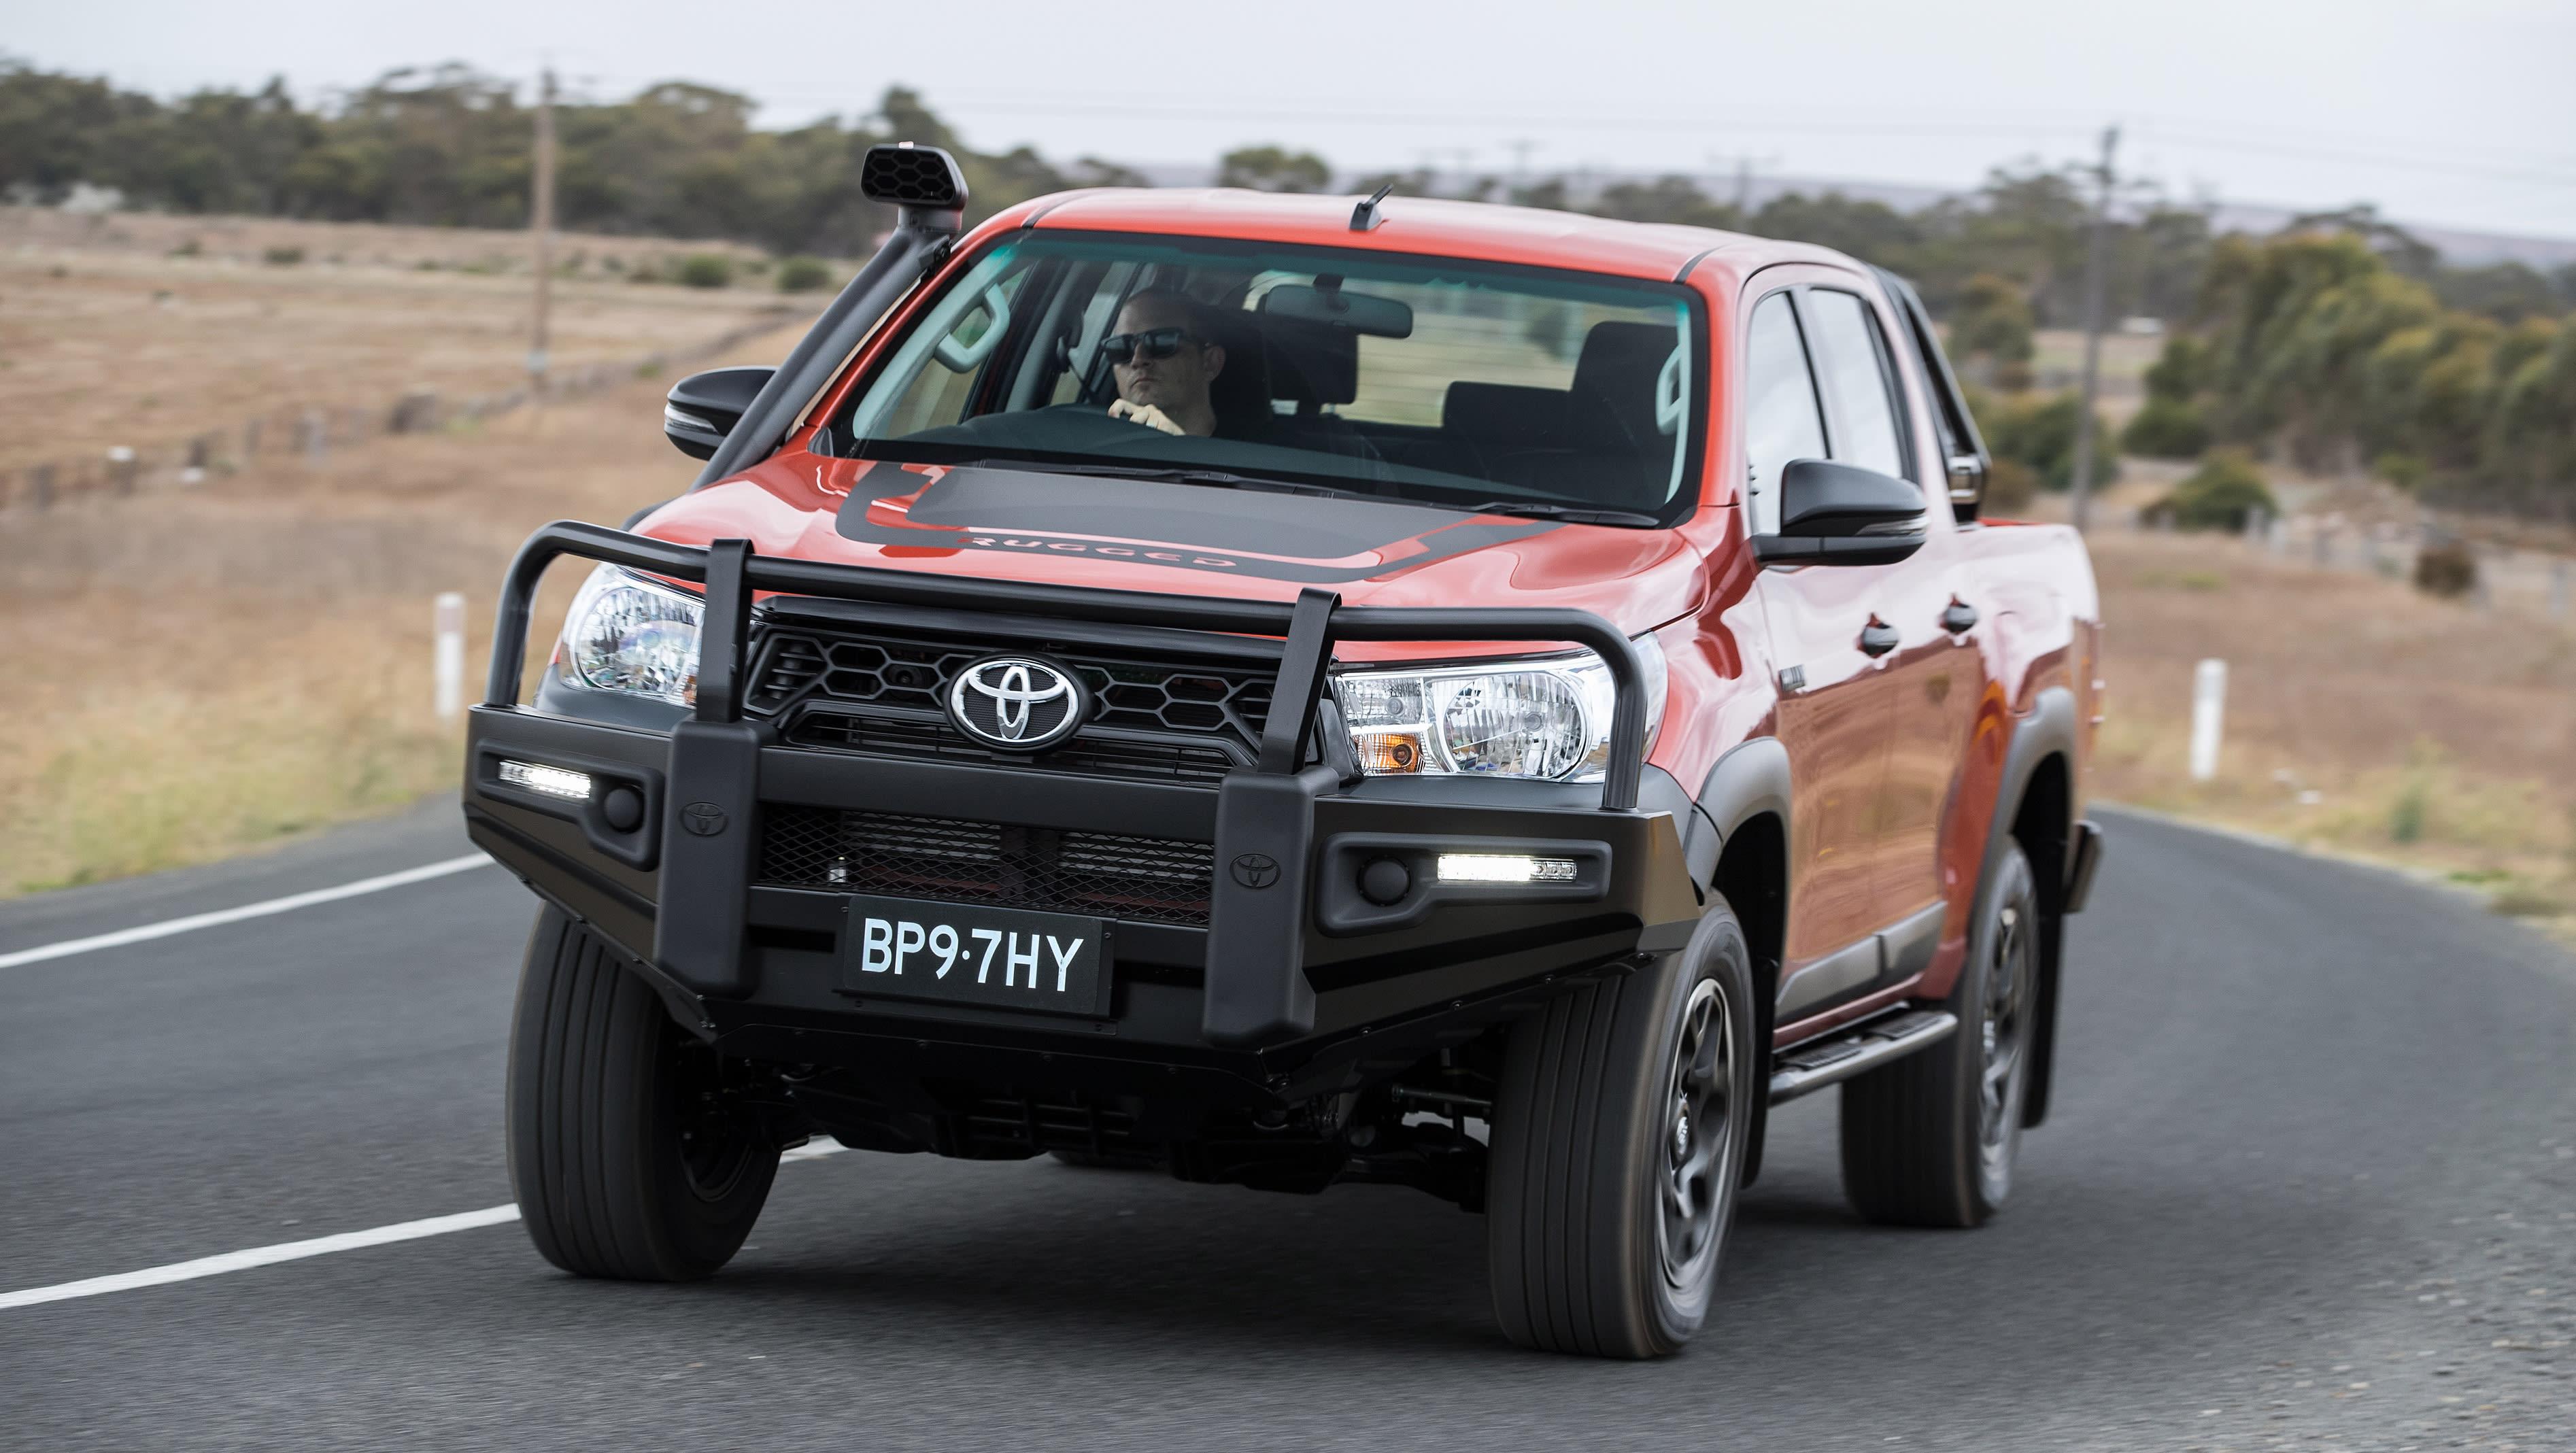 Toyota HiLux, Prado, Fortuner DPF problems could ignite